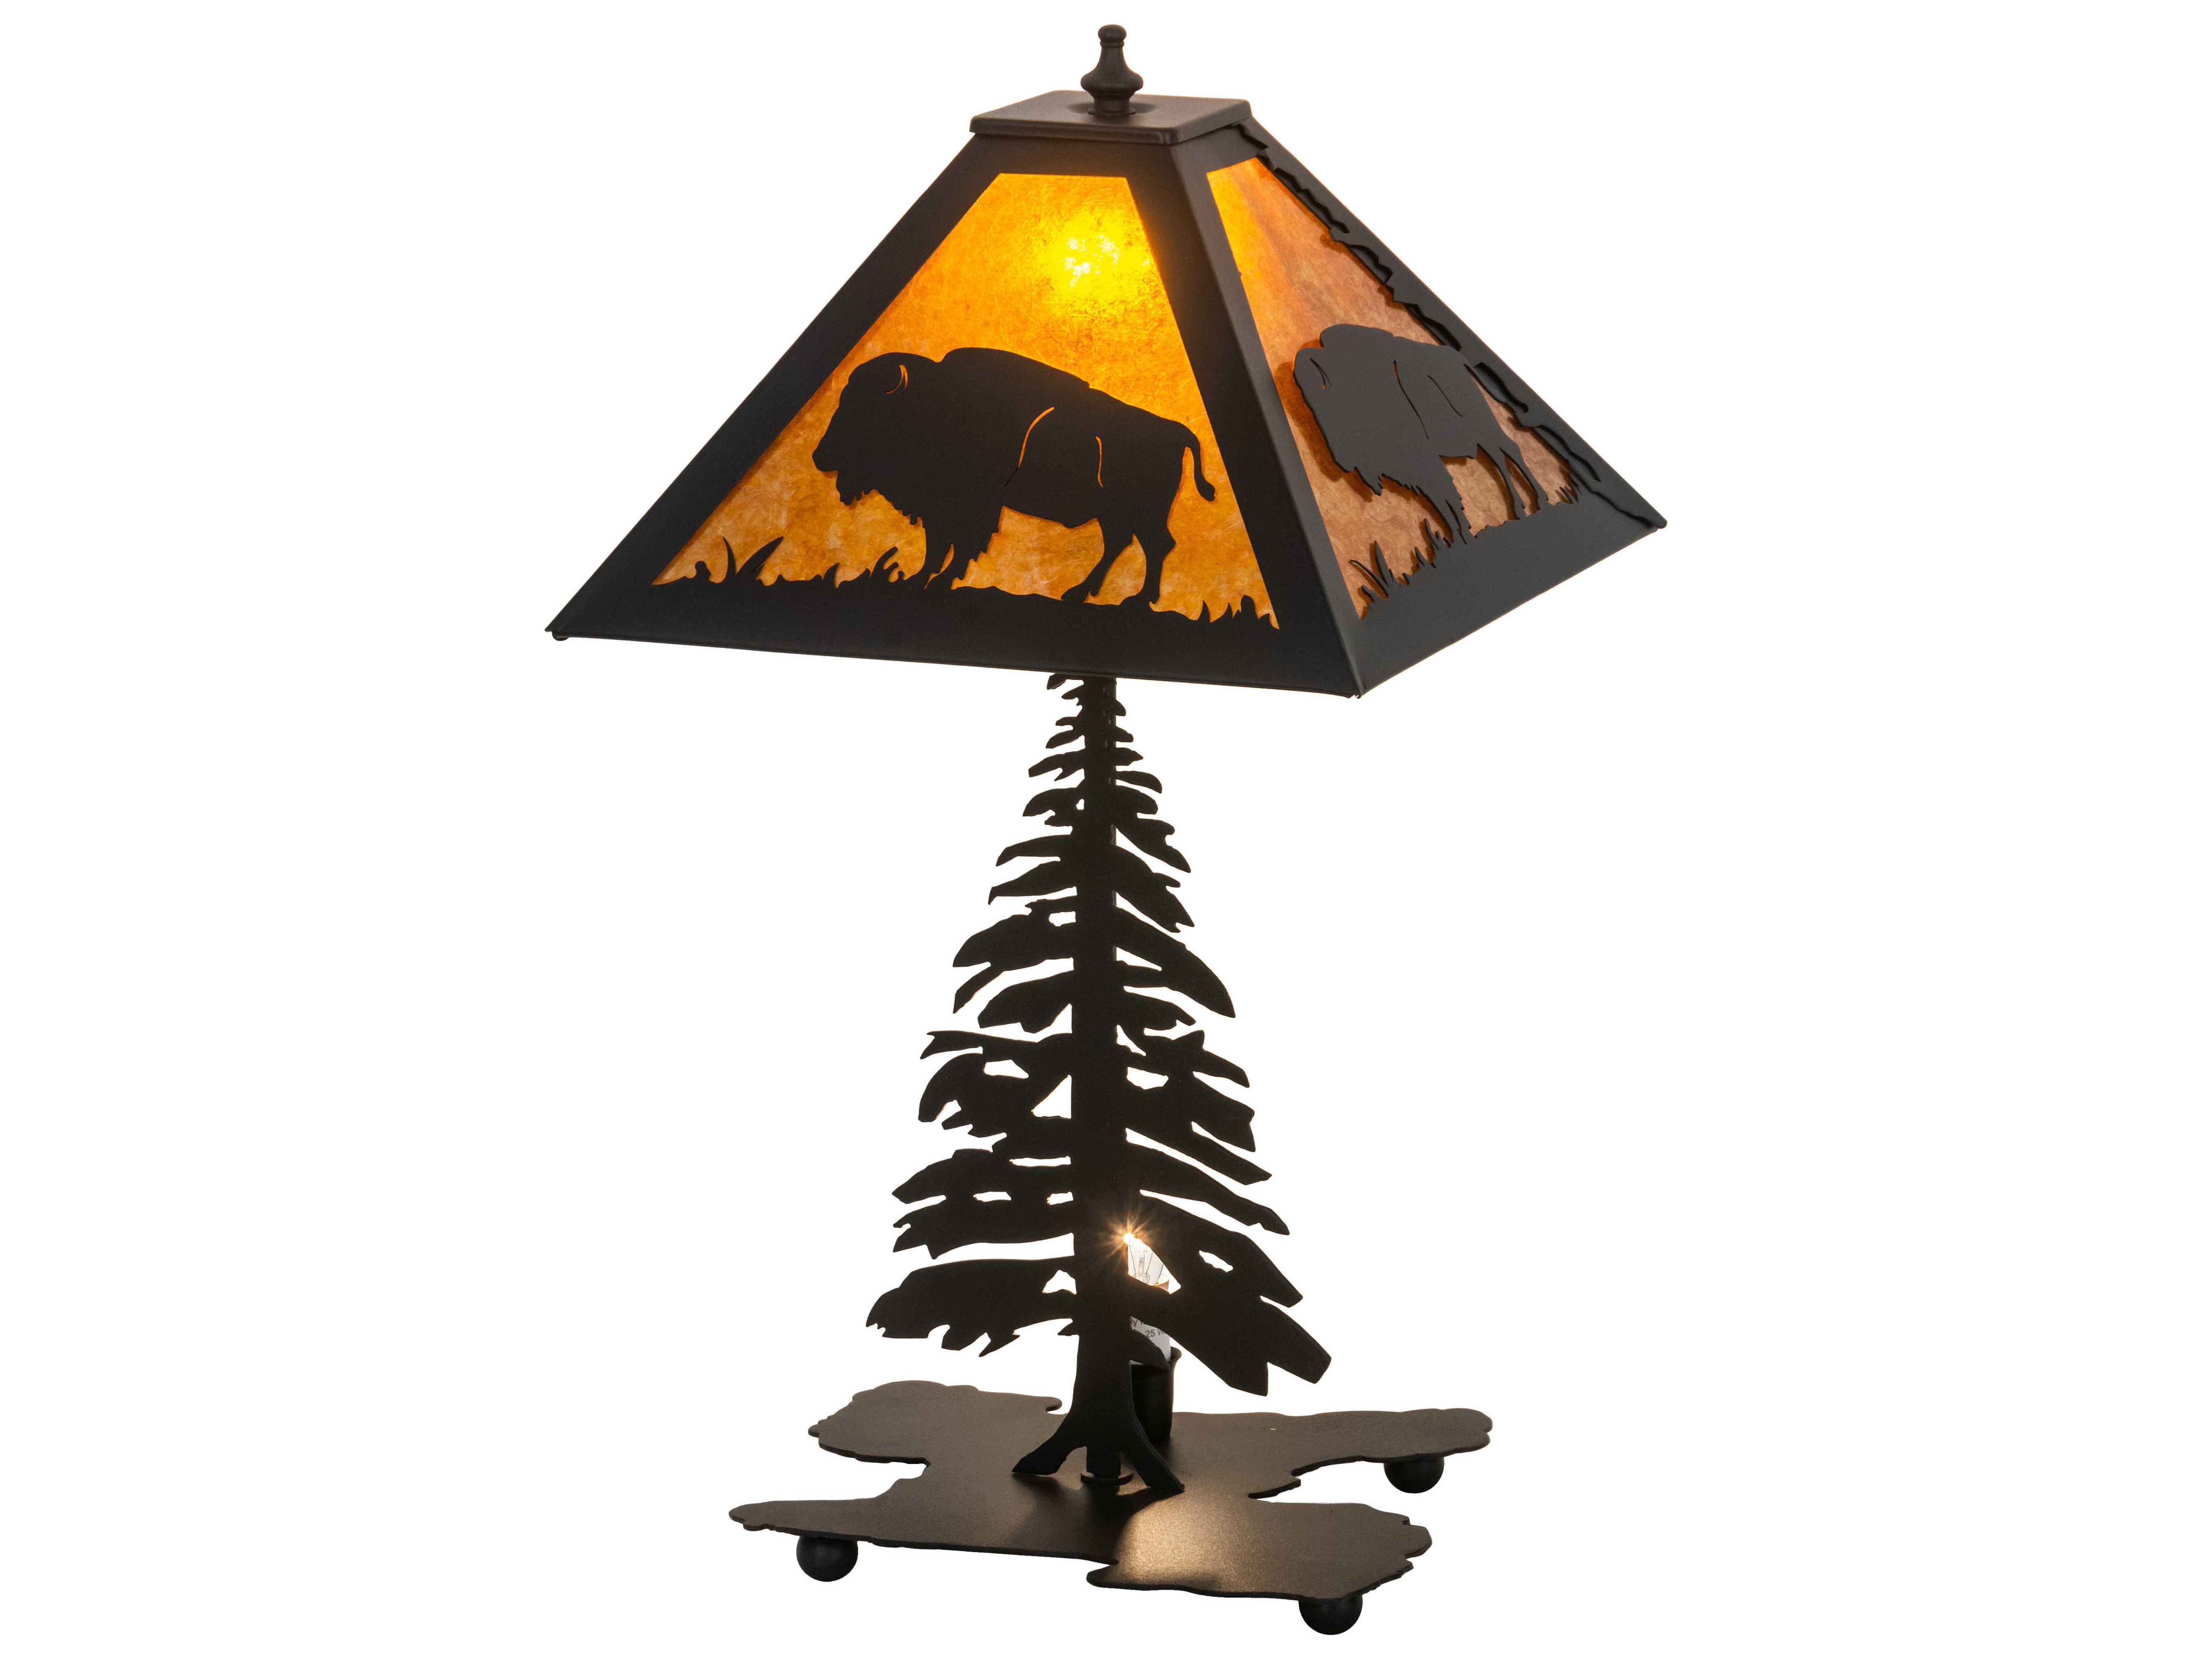 Meyda Buffalo Black Amber Mica 2 Light Rustic Lodge Table Lamp My214532